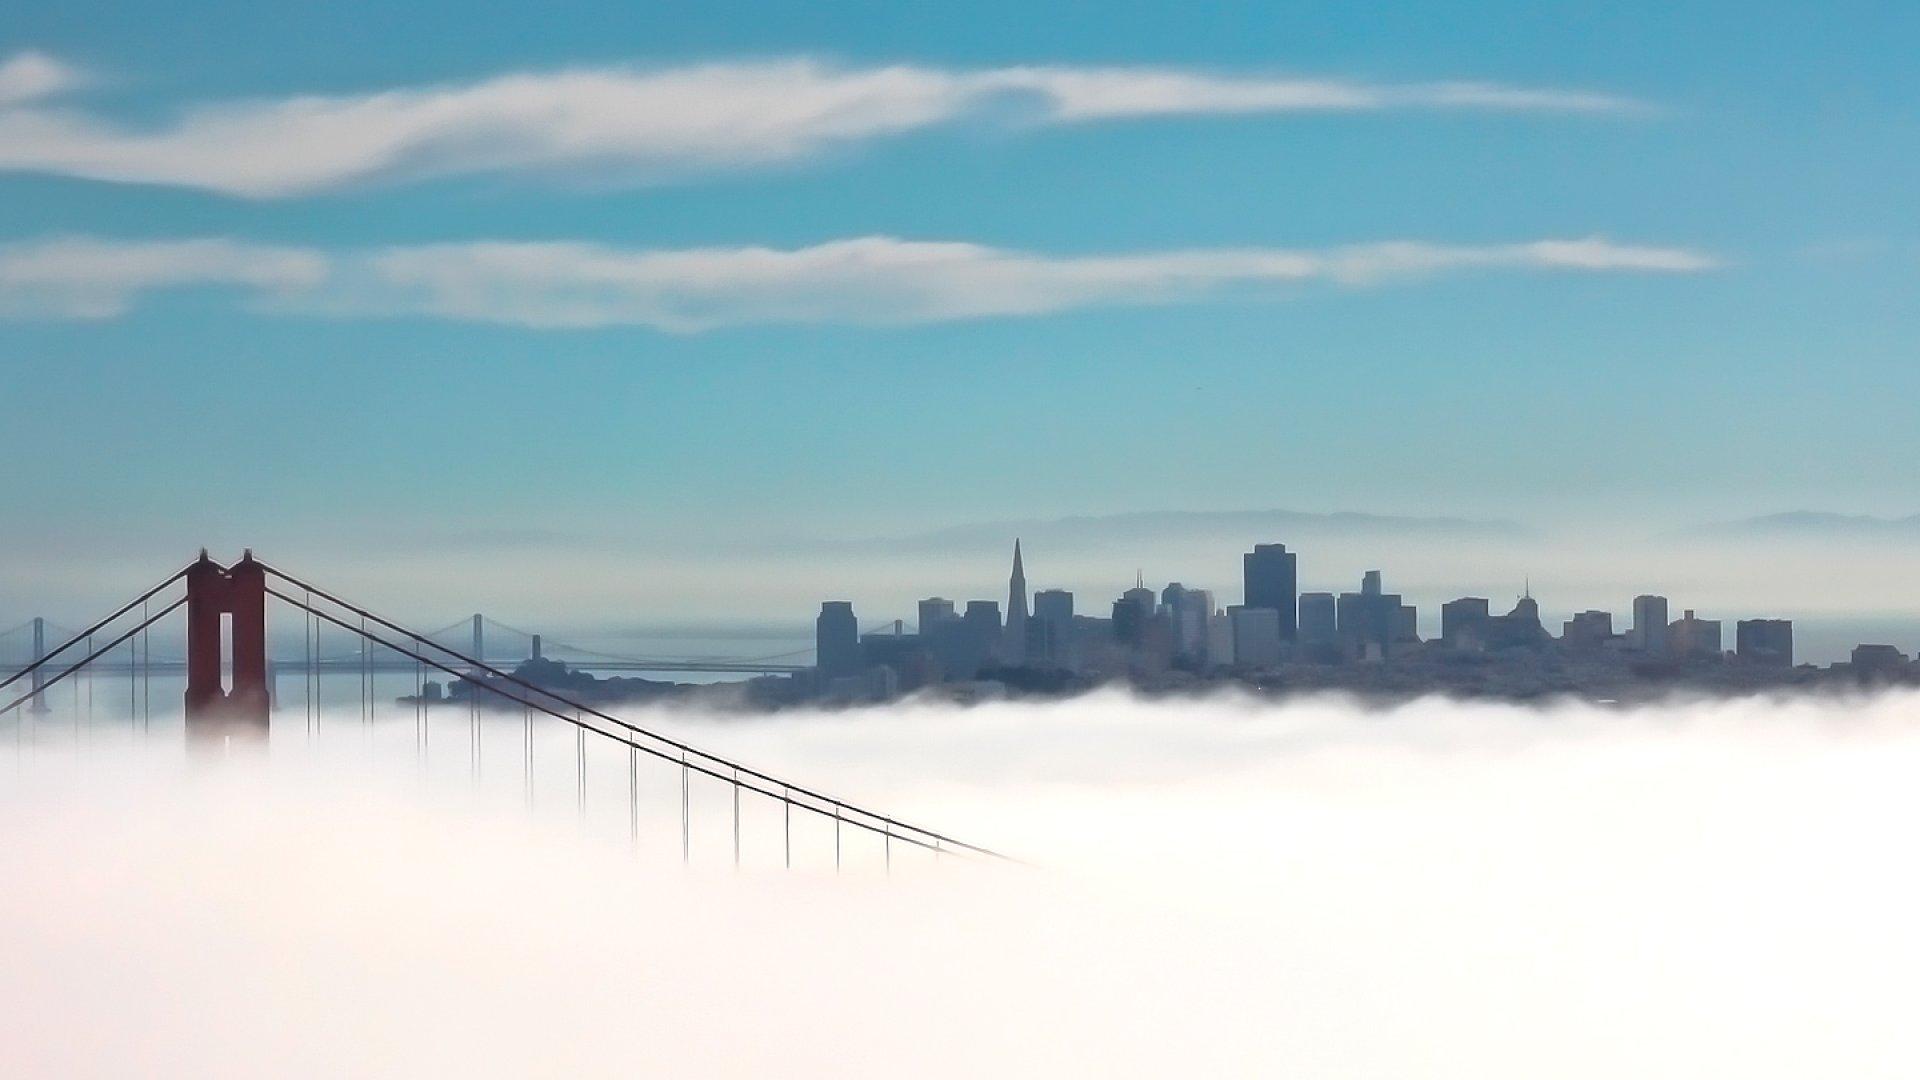 Tim Draper Wants to Break California Into 6 States